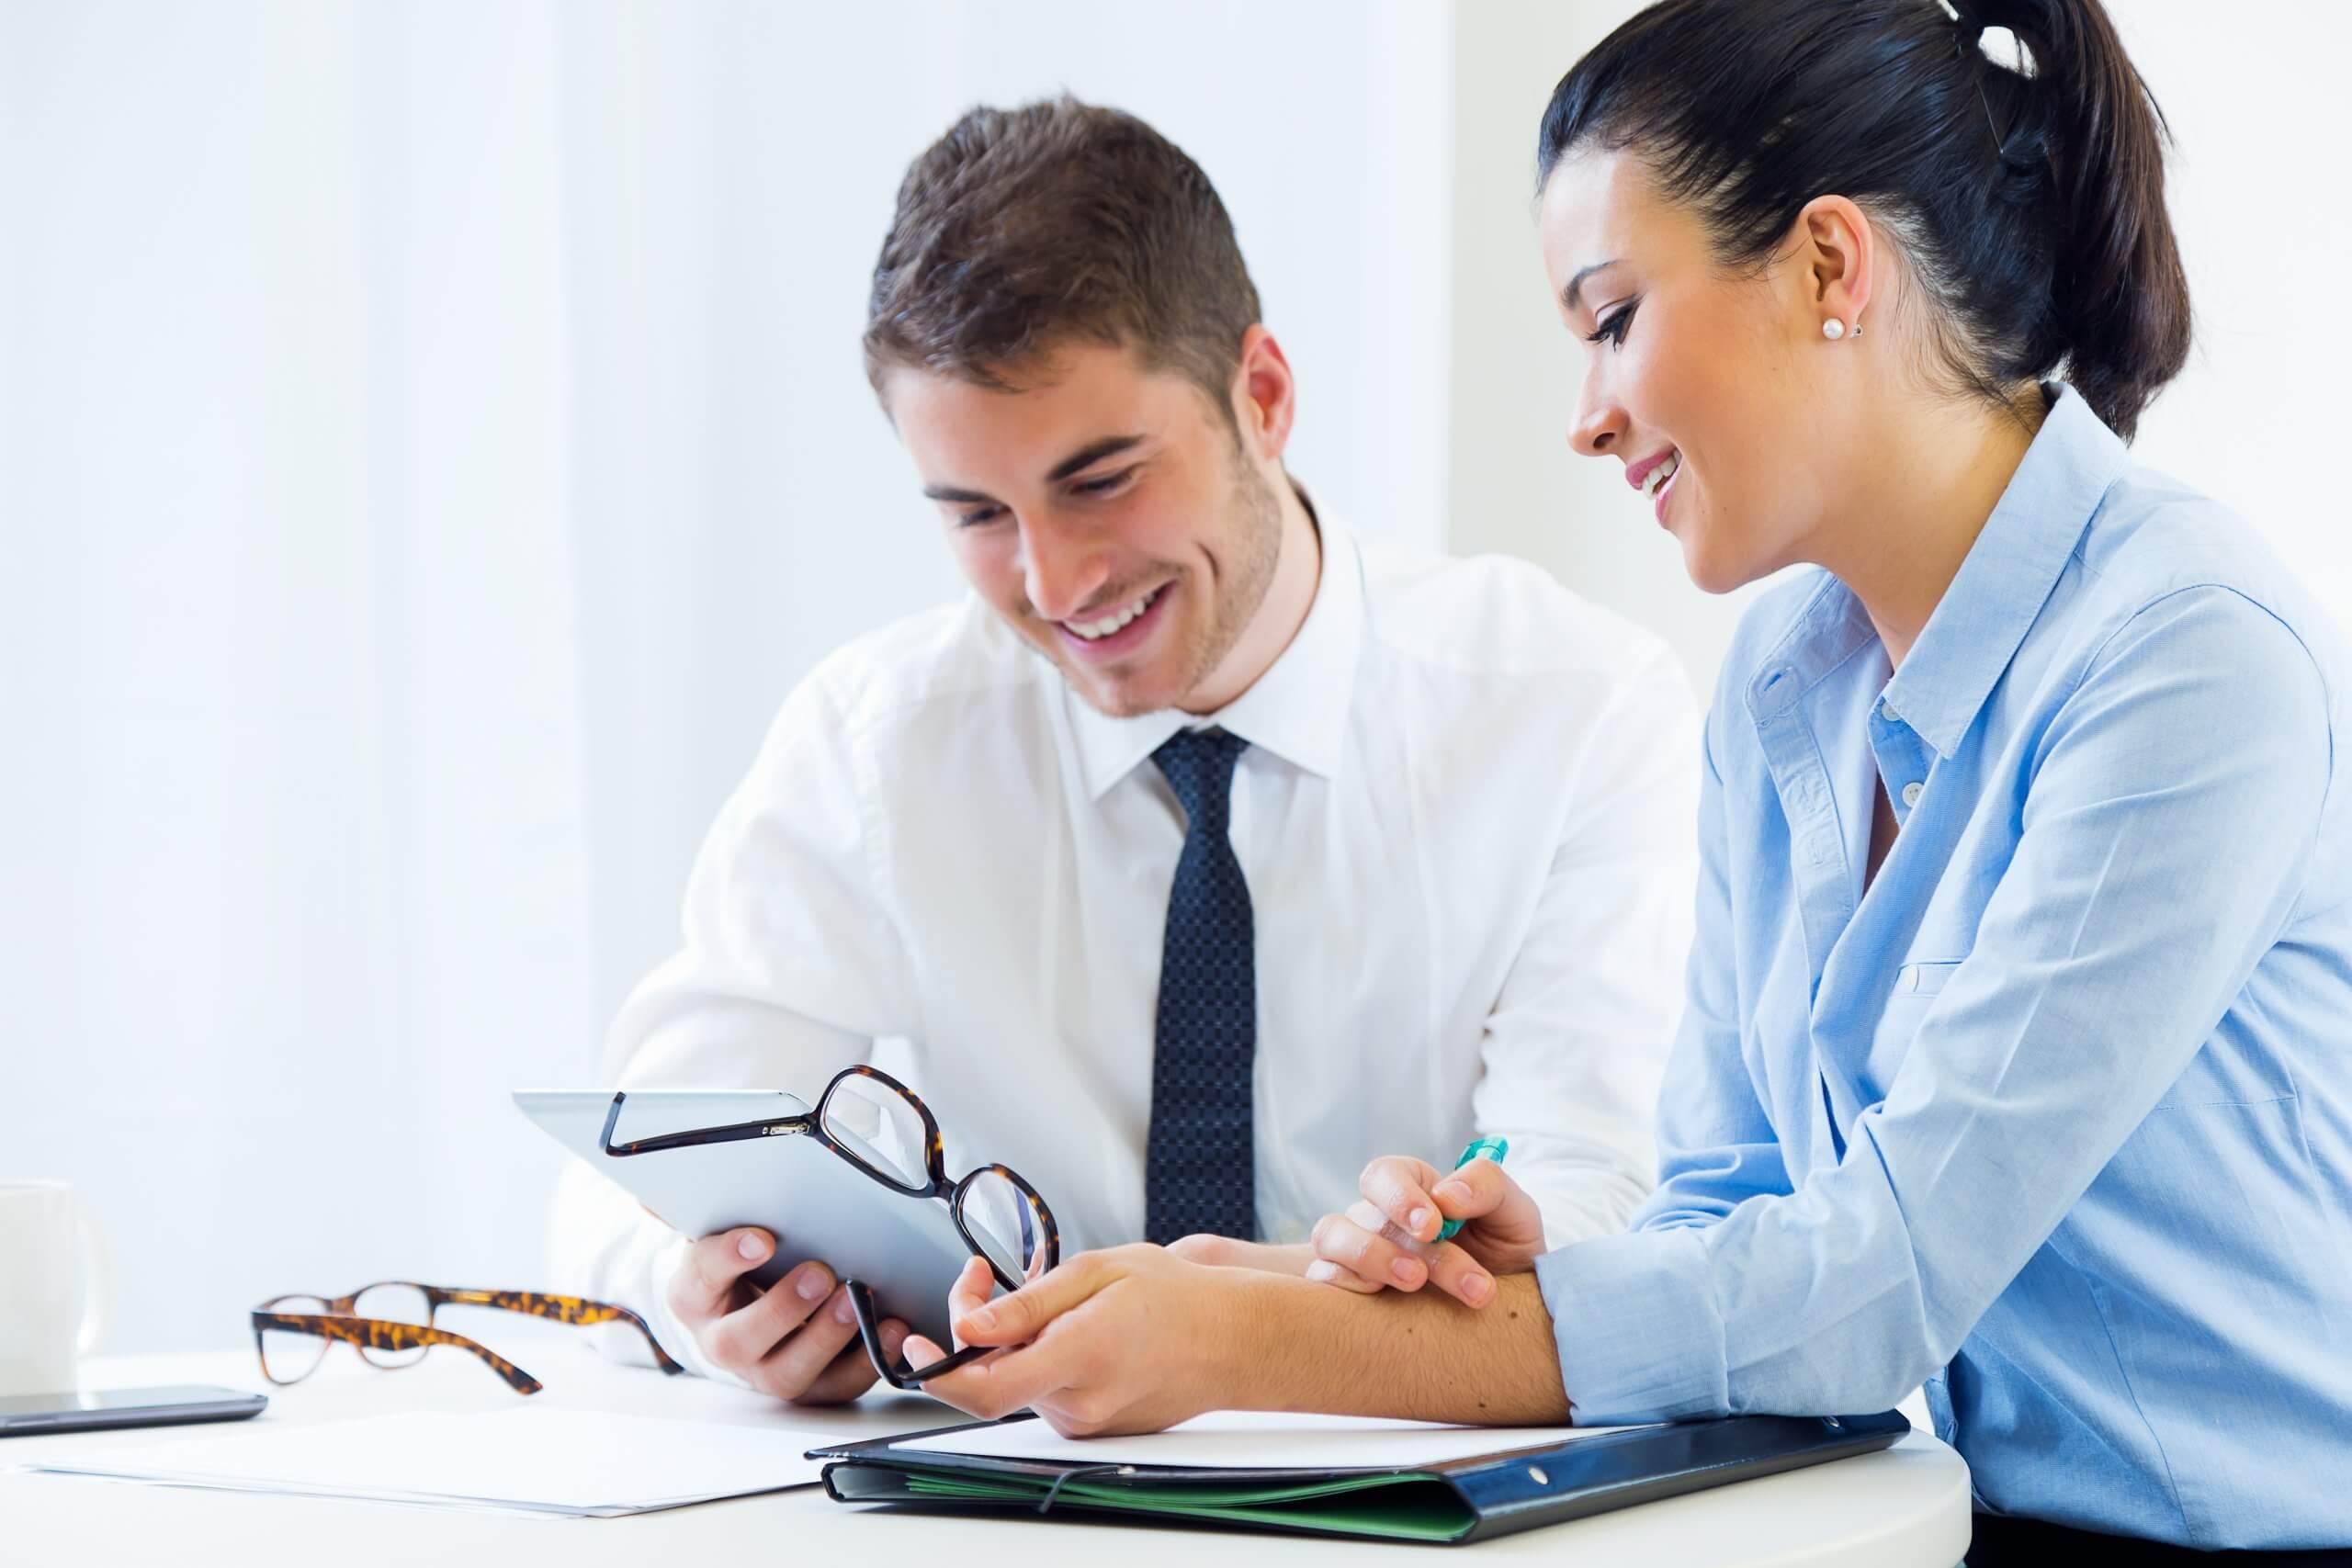 Tipos de empréstimos e financiamentos: entenda as diferenças